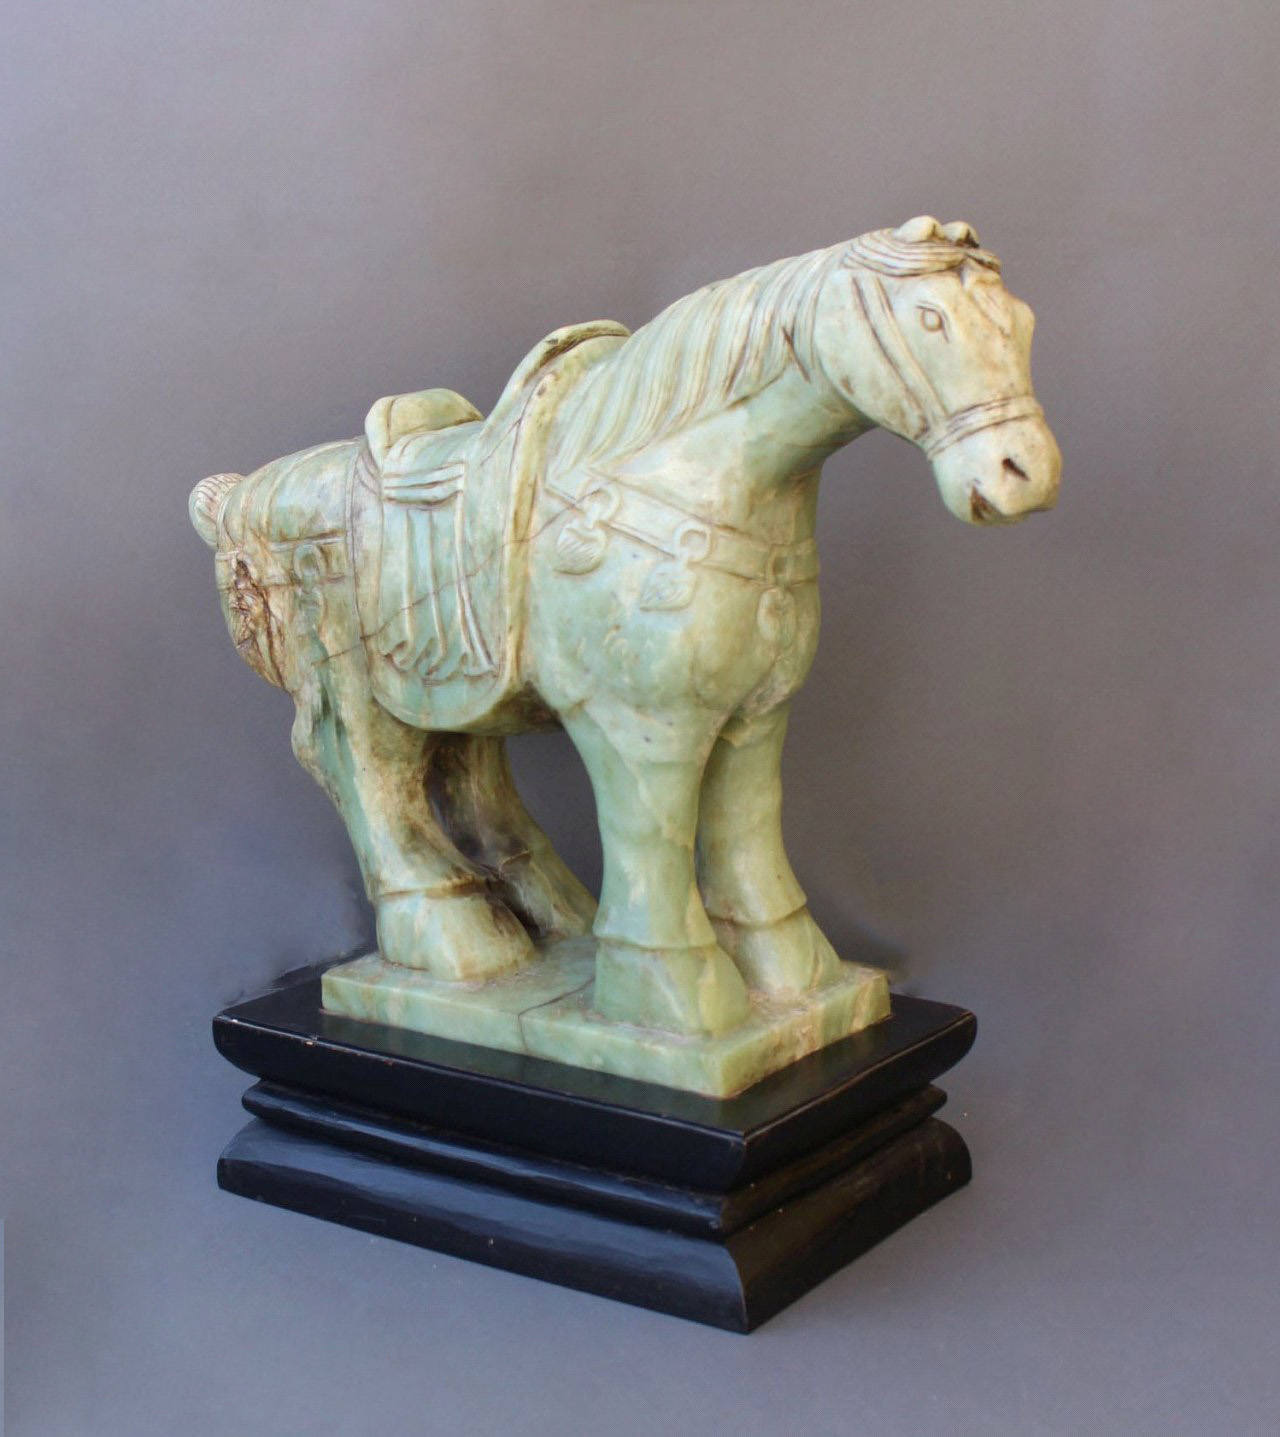 Sehr große Pferdefigur, Serpentin-Jade